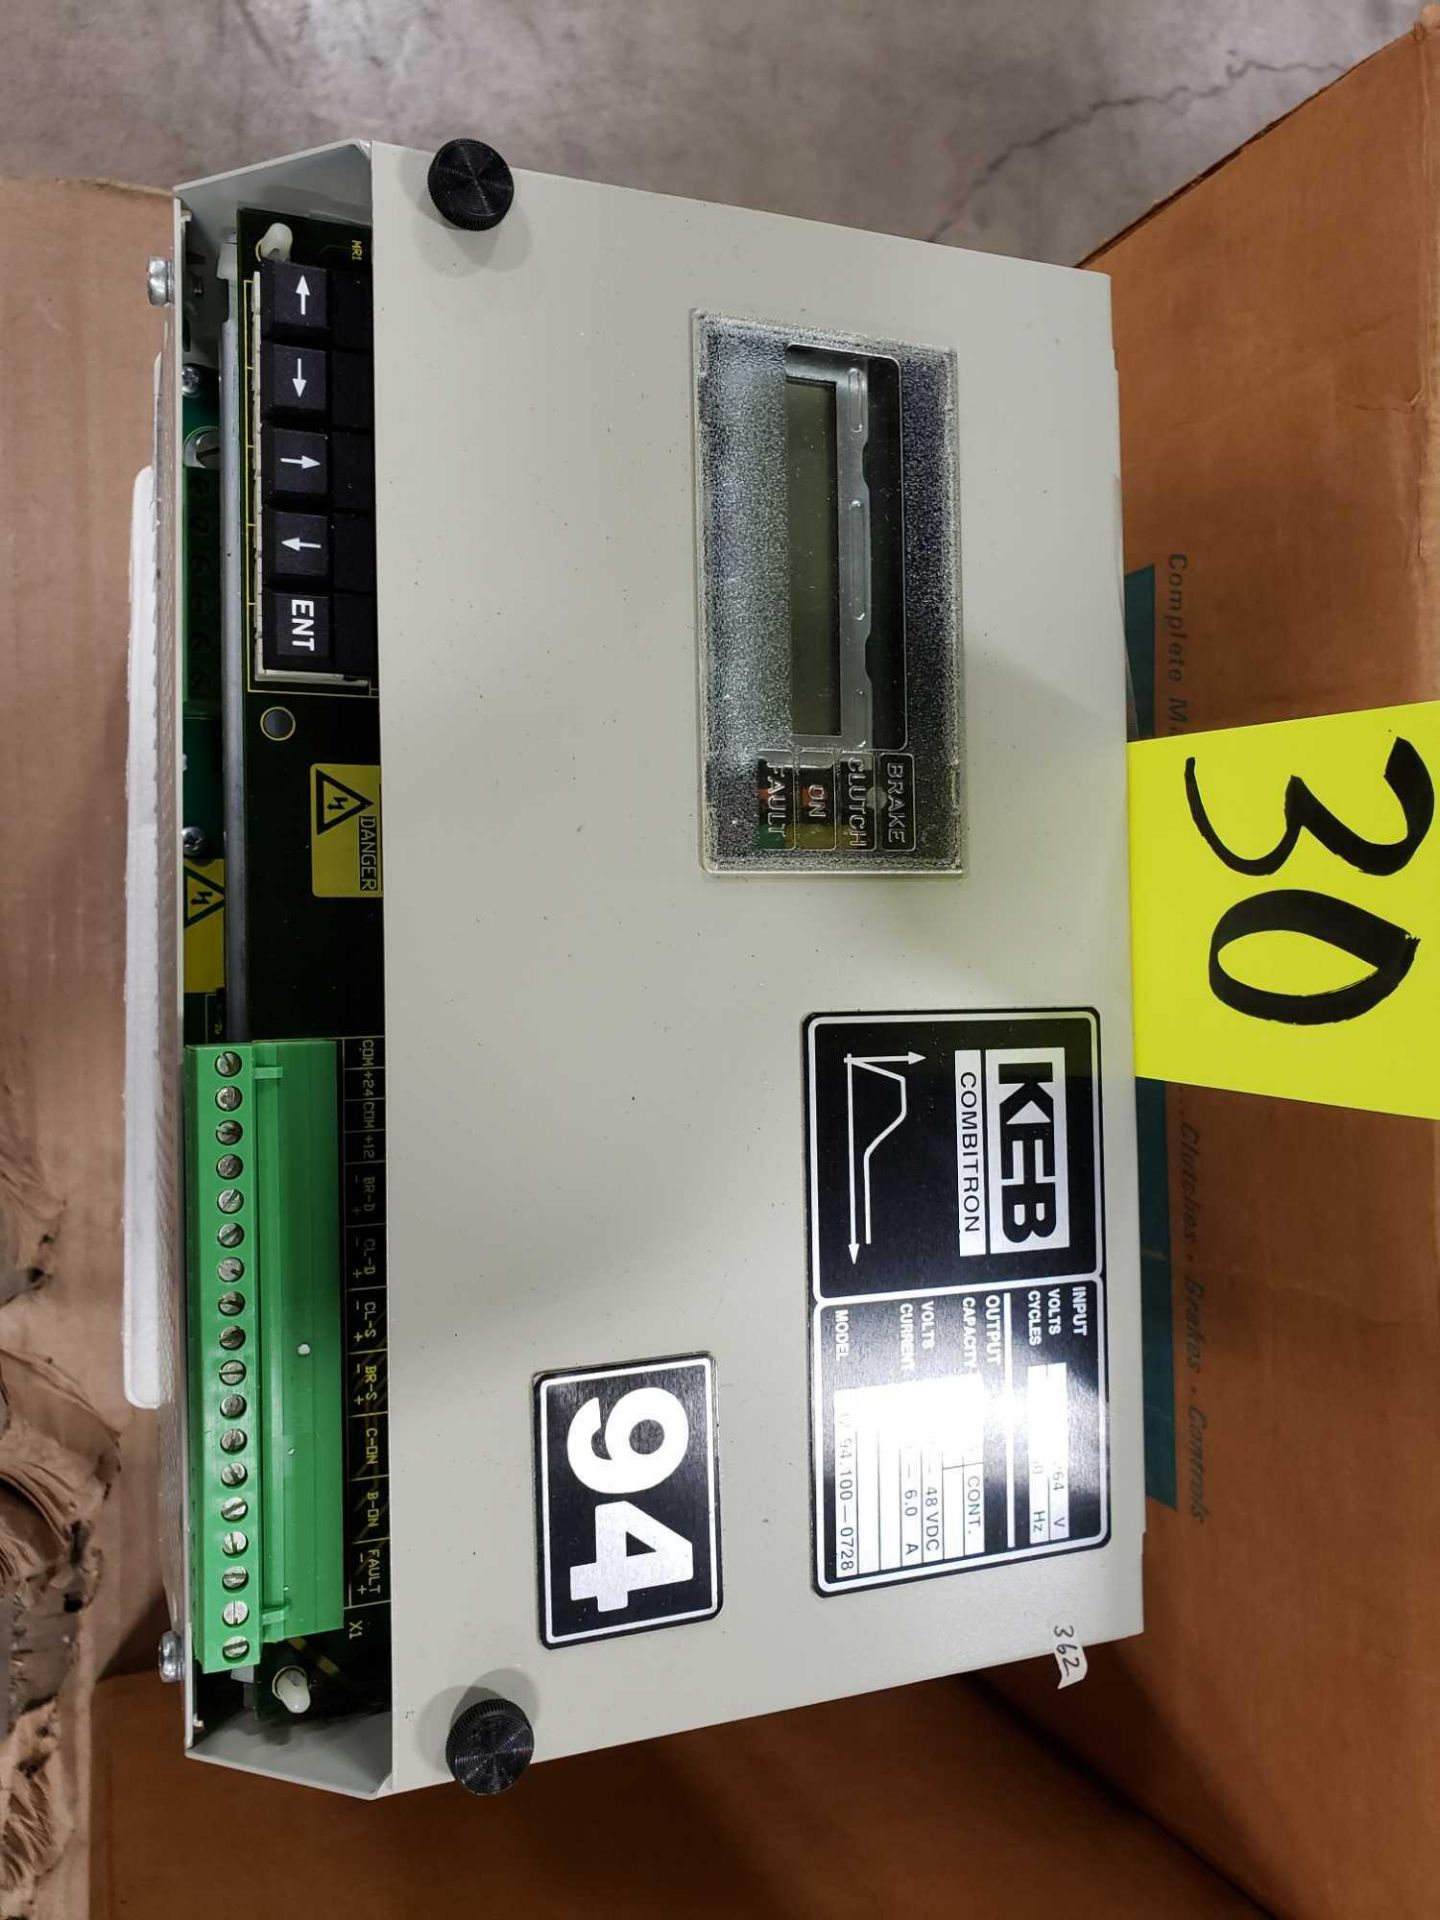 Lot 30 - KEB Combitron drive model 32.94.100-0728, 90-264v input, 12-48vdc volt output. New as pictured.